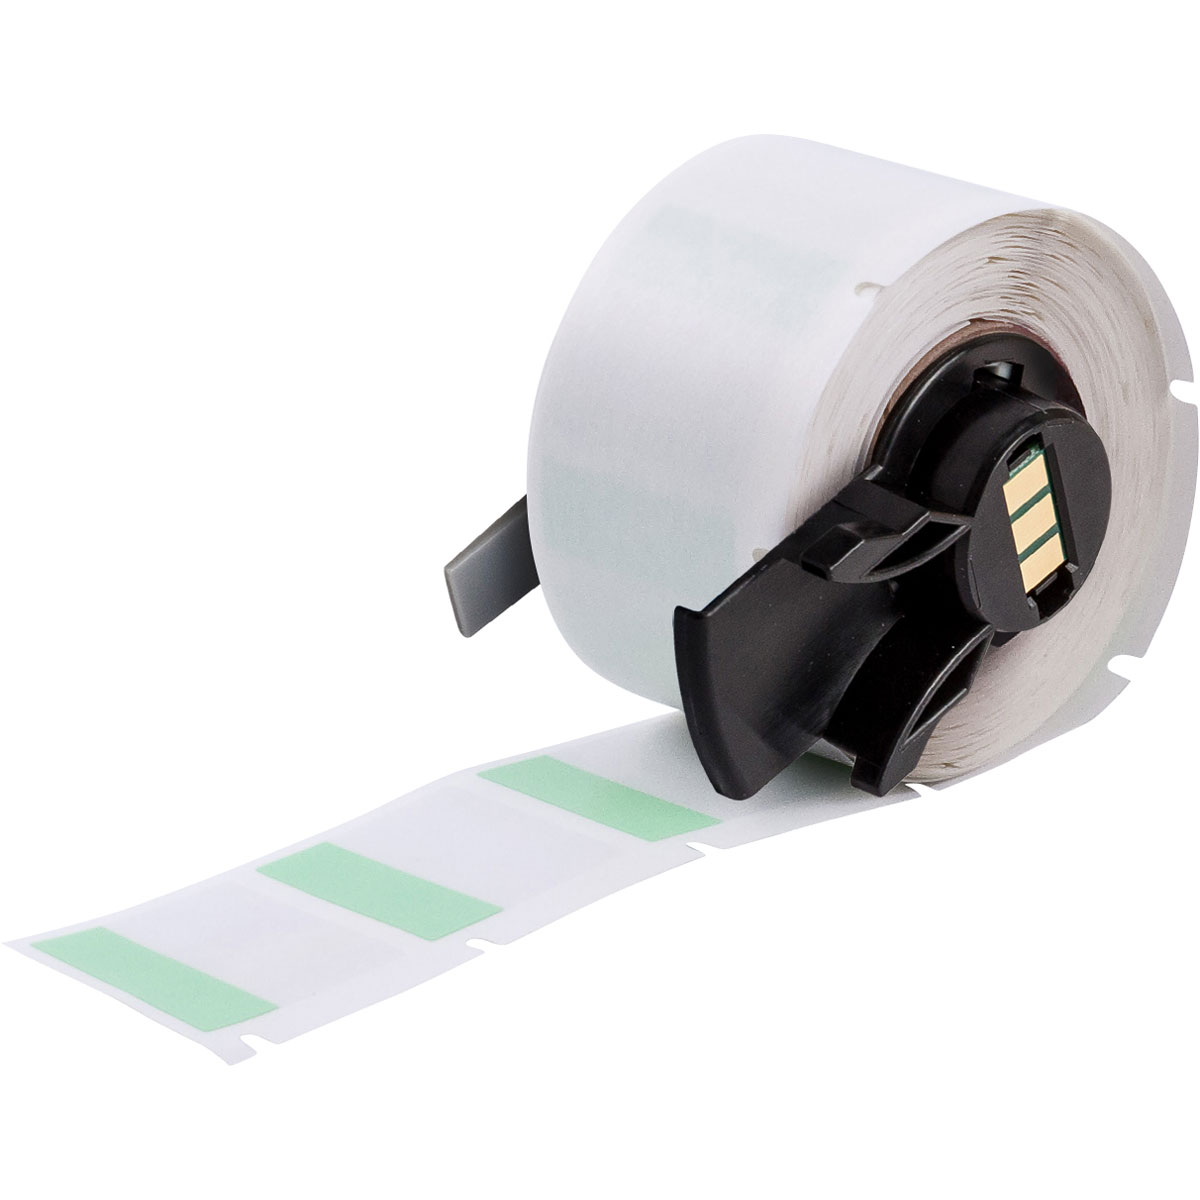 "Brady PTL-19-427-GR Green Self-Laminating Vinyl Labels for TLS2200 / TLS-PC Link Printers, 1"" x 1"" label, 12-10ga wire"